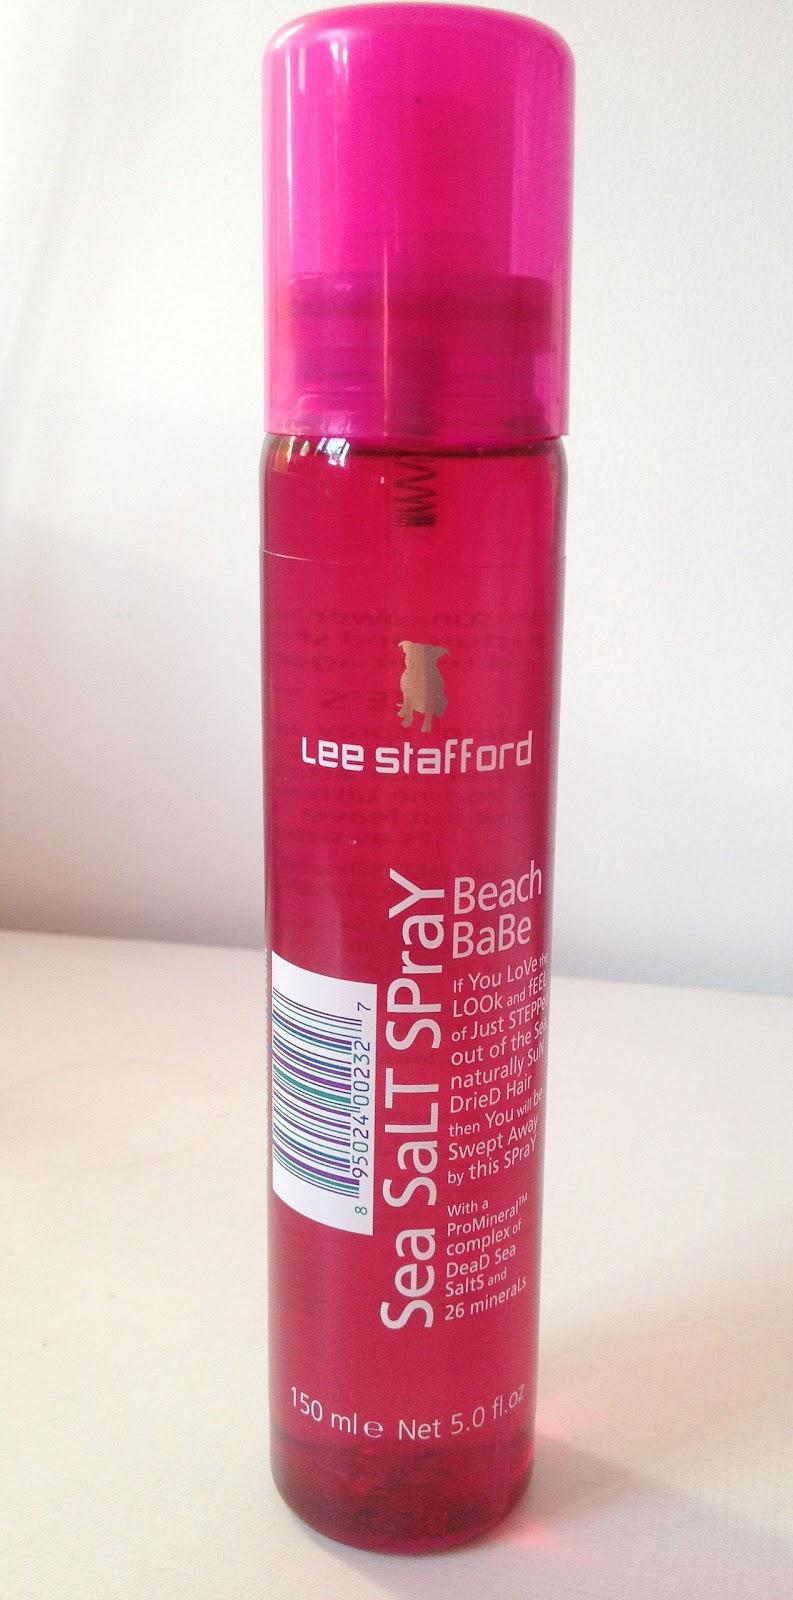 Lee Stafford Beach Babe Sea Salt Hair Spray 5 oz - PopScreen